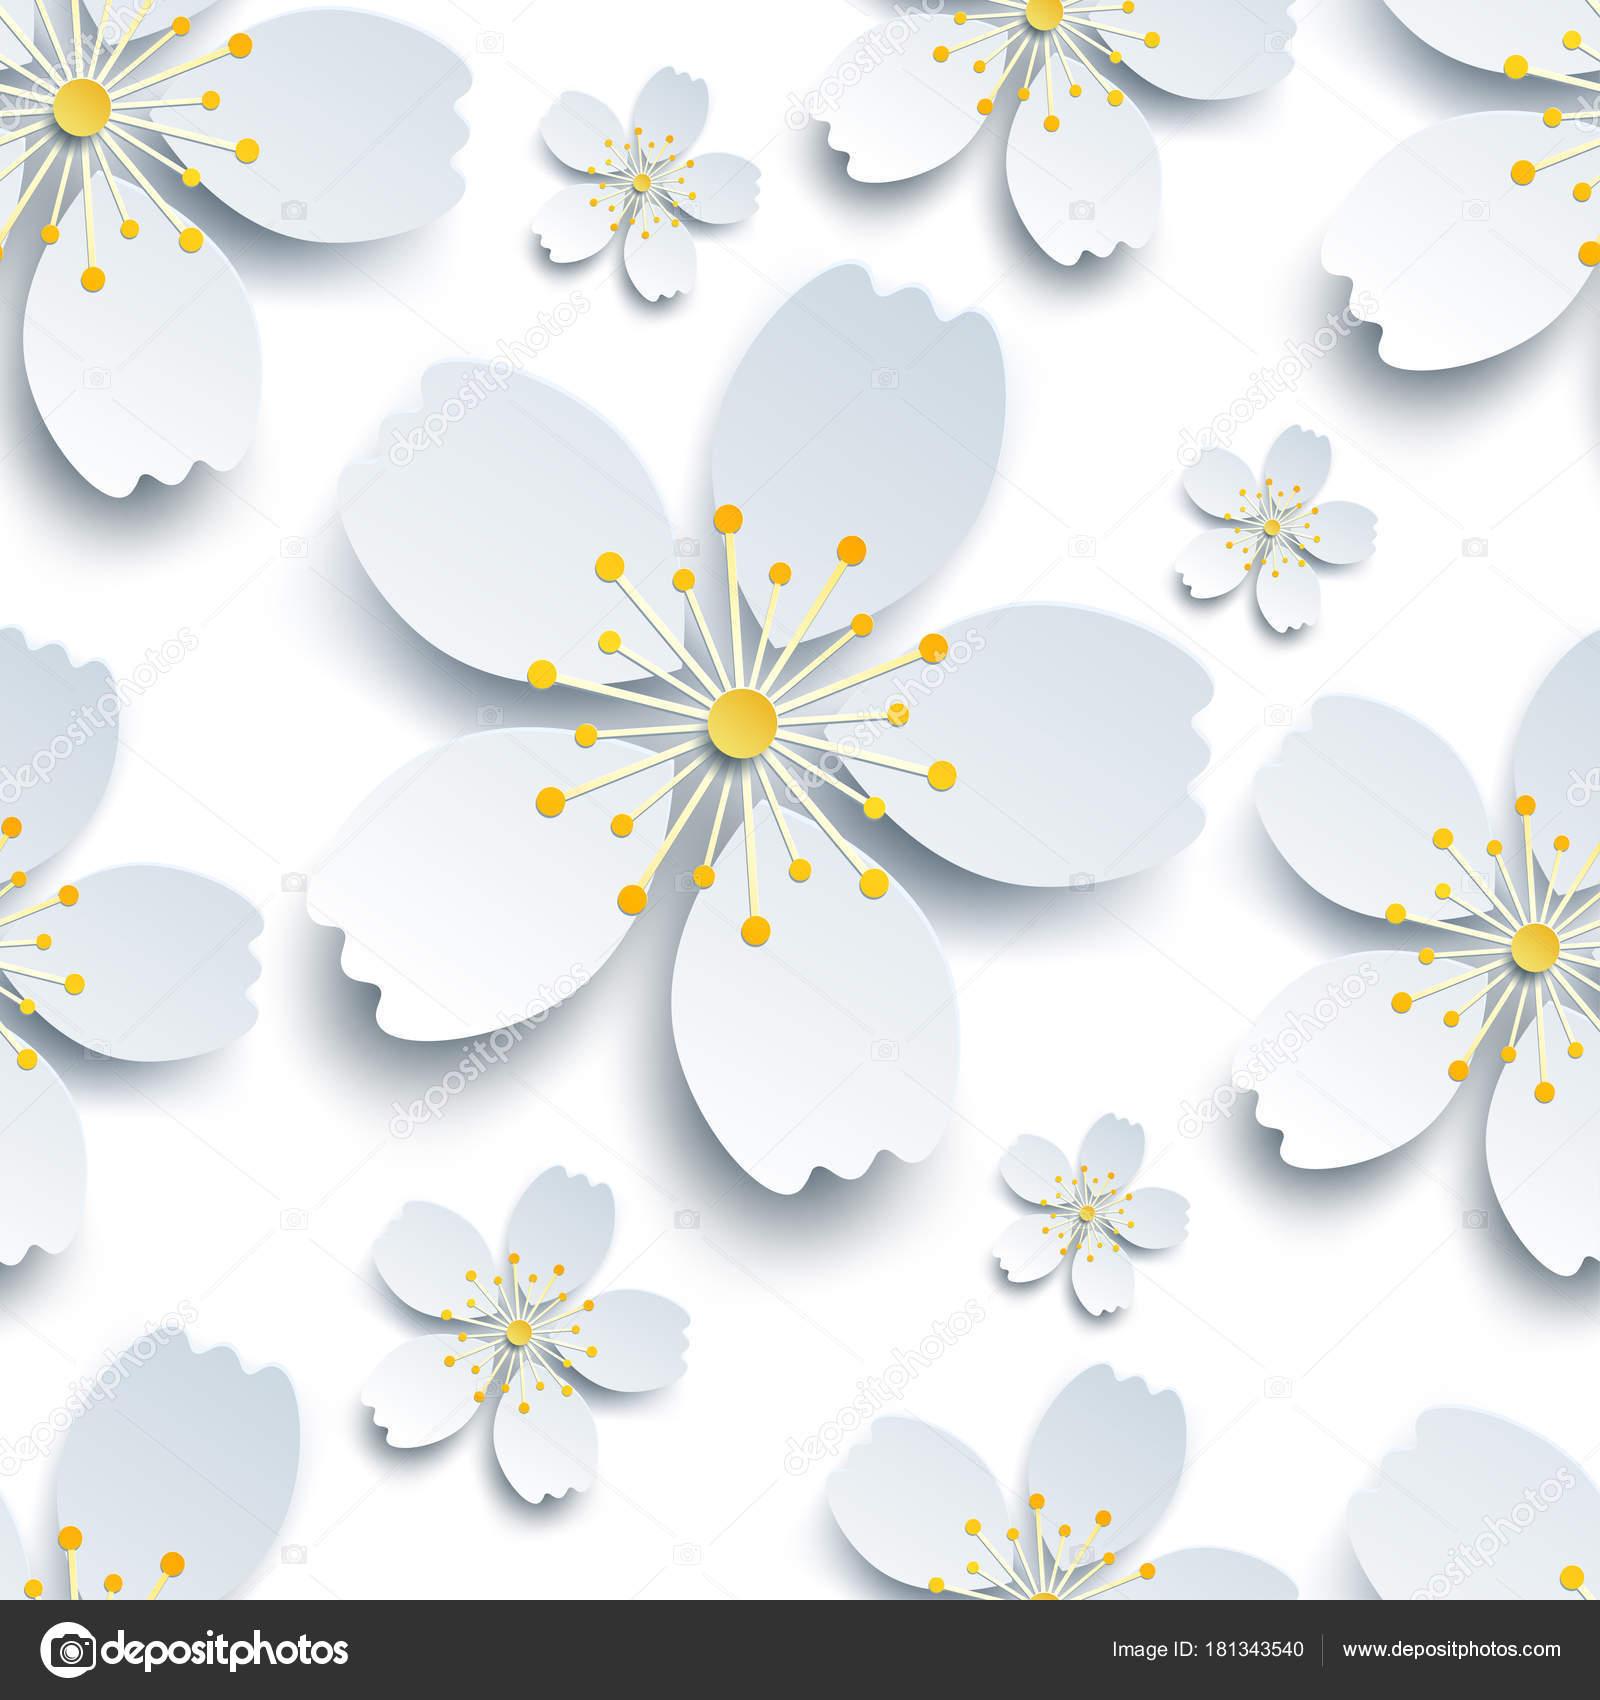 Elegant Modele Sans Couture Avec Sakura Blanches Fleurs Image